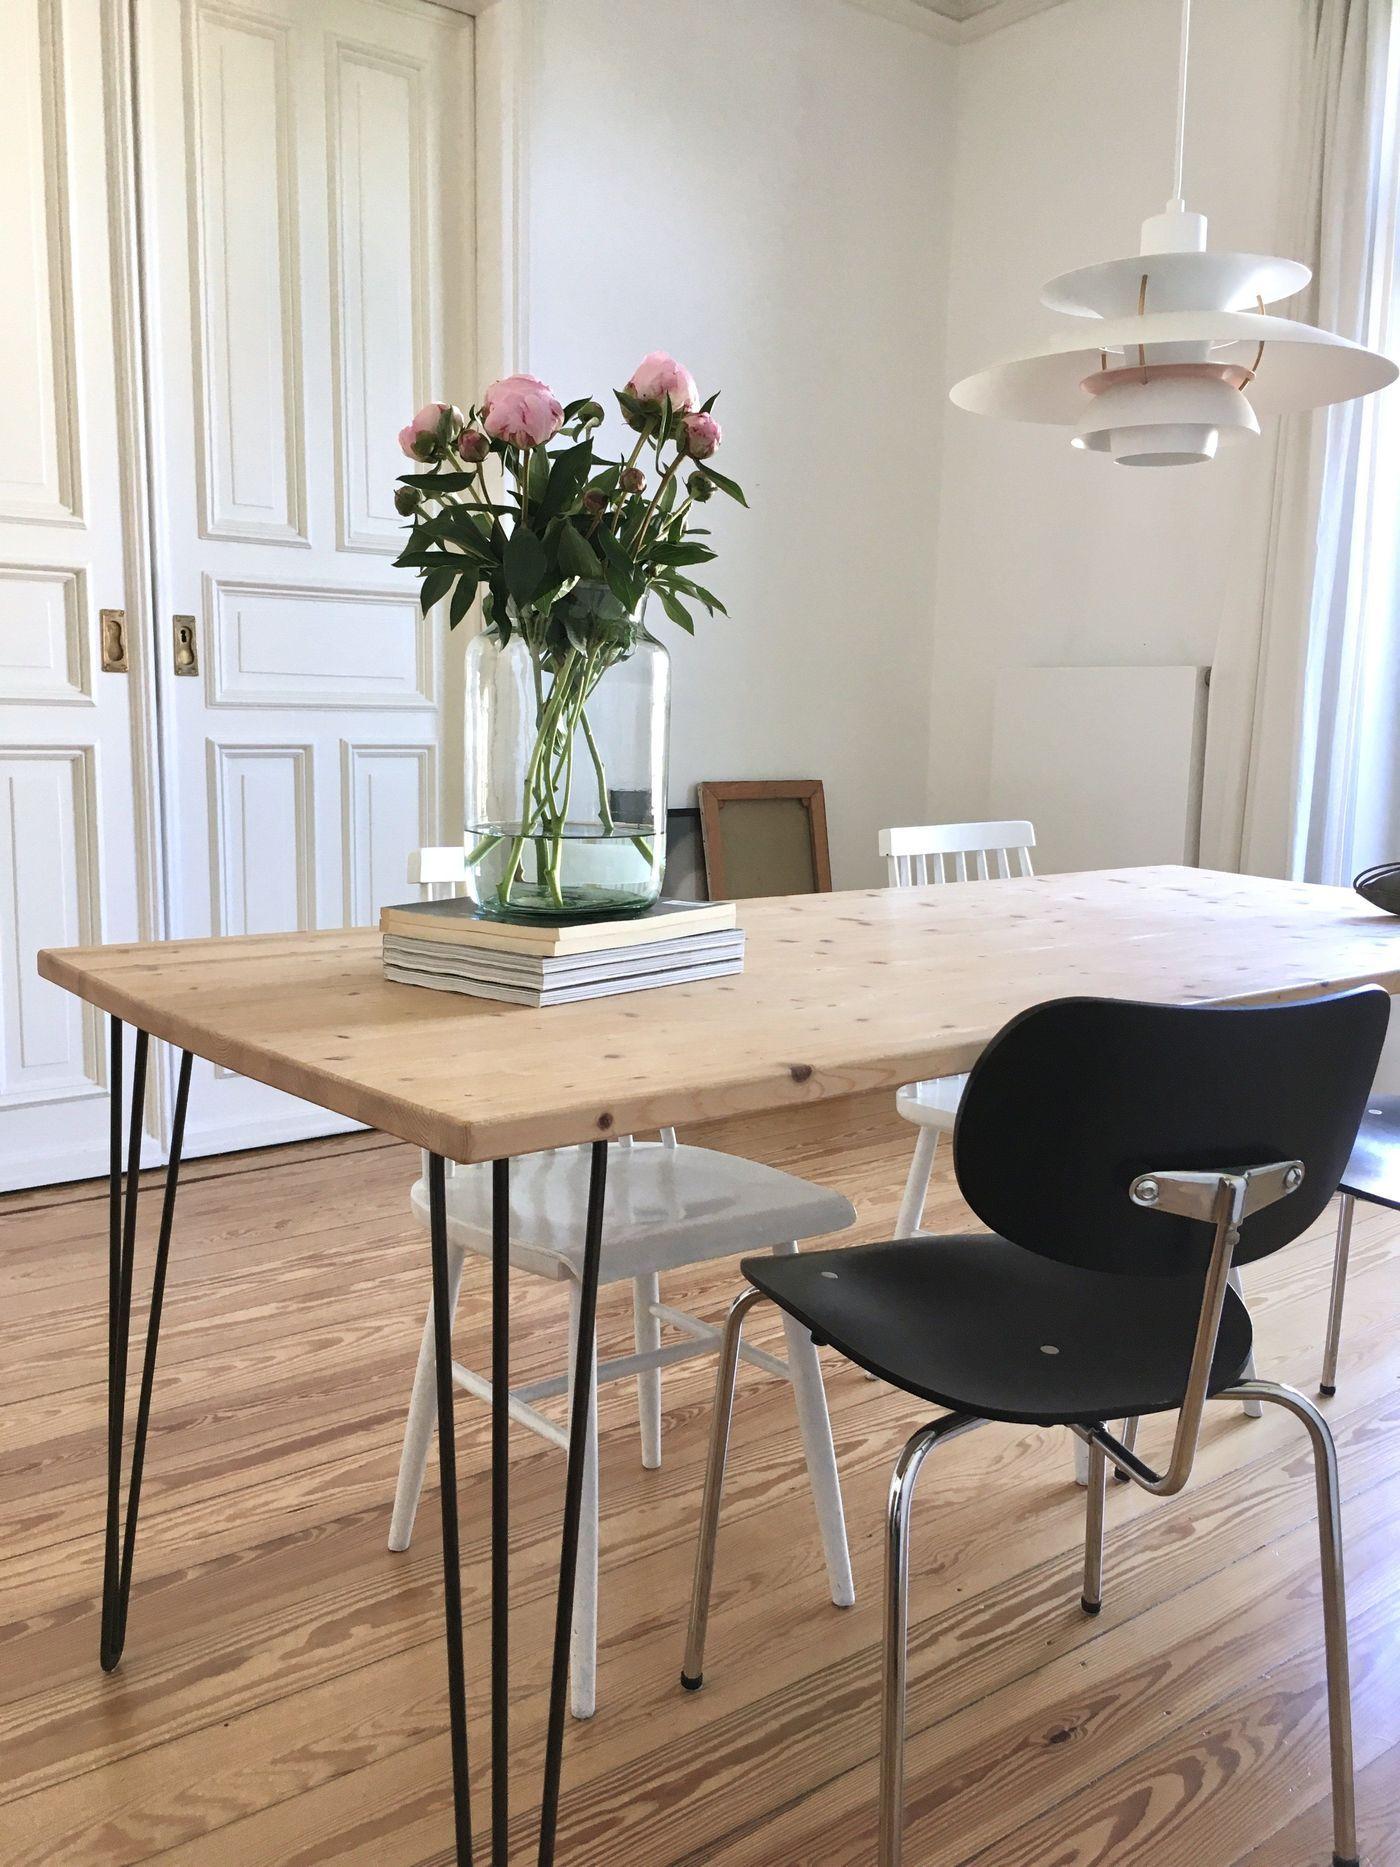 rustikaler esstisch selber bauen latest rustikaler couchtisch holz design inspiration lapazca. Black Bedroom Furniture Sets. Home Design Ideas